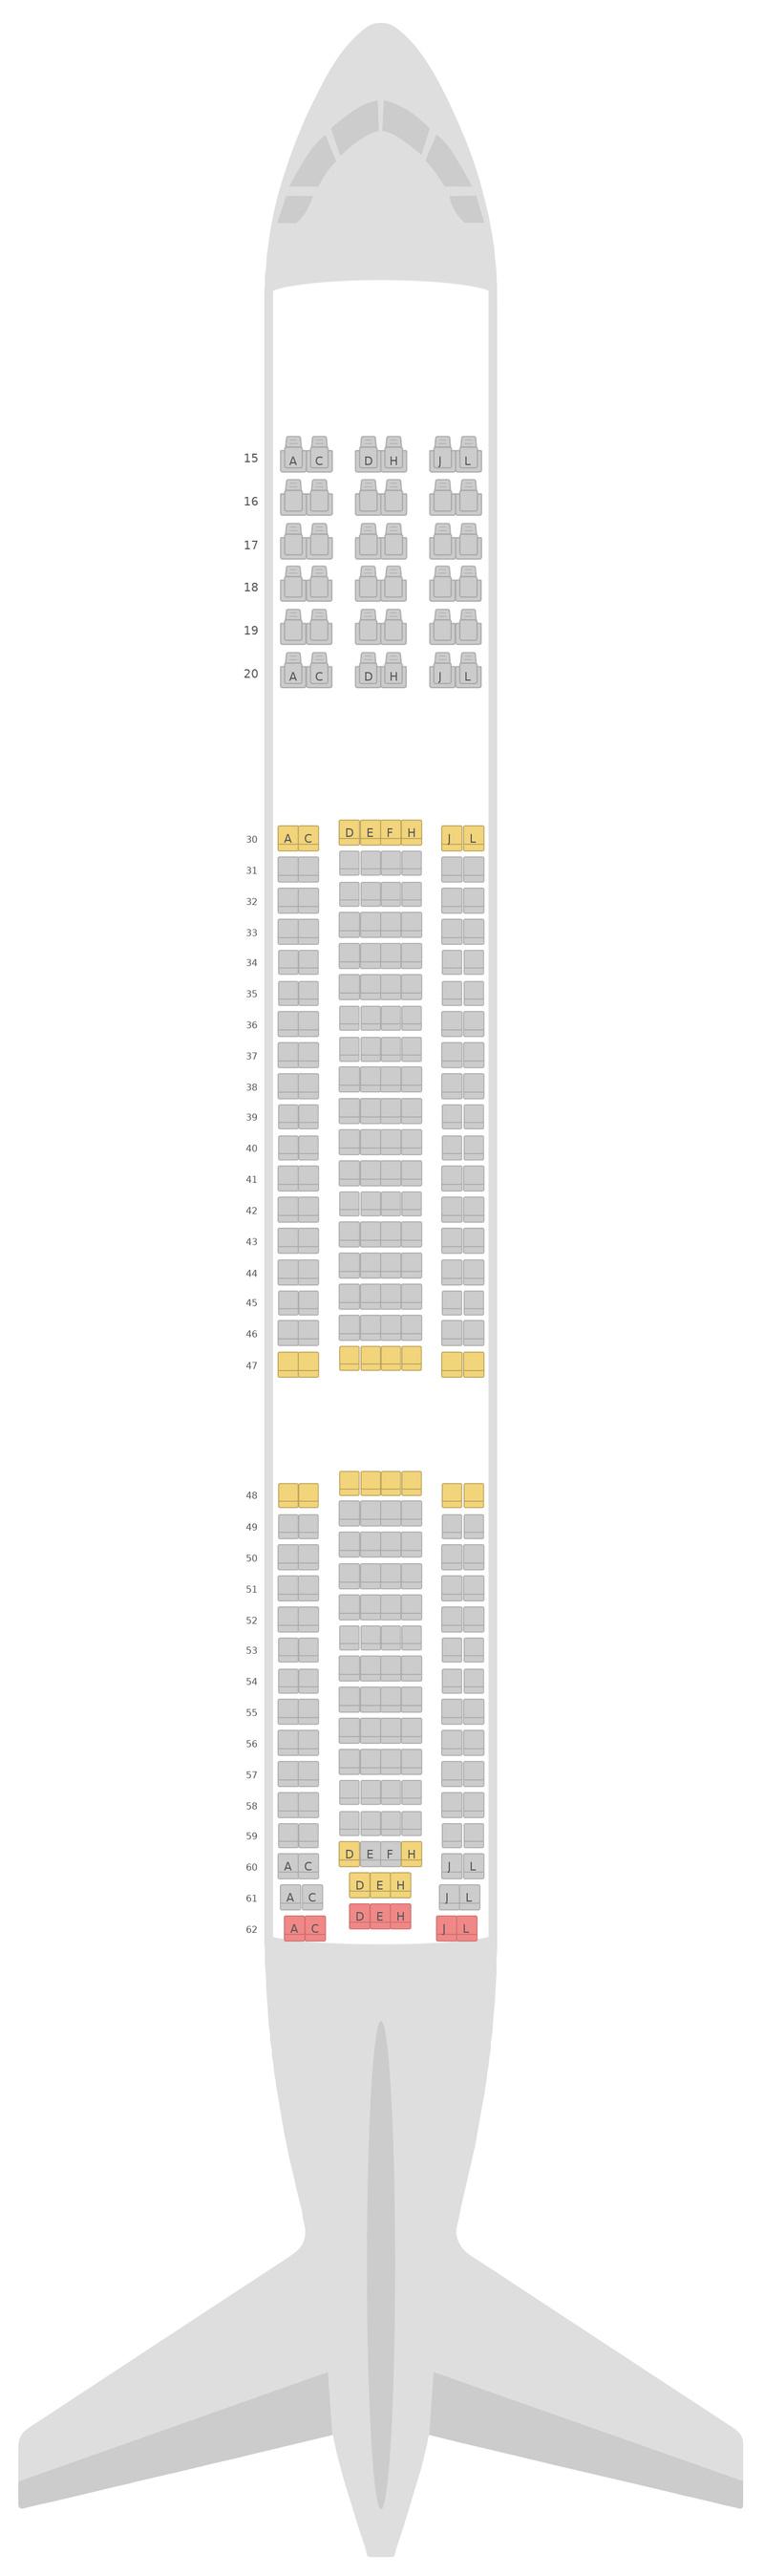 Seat Map Saudi Arabian Airlines Airbus A330-300 (333) v1